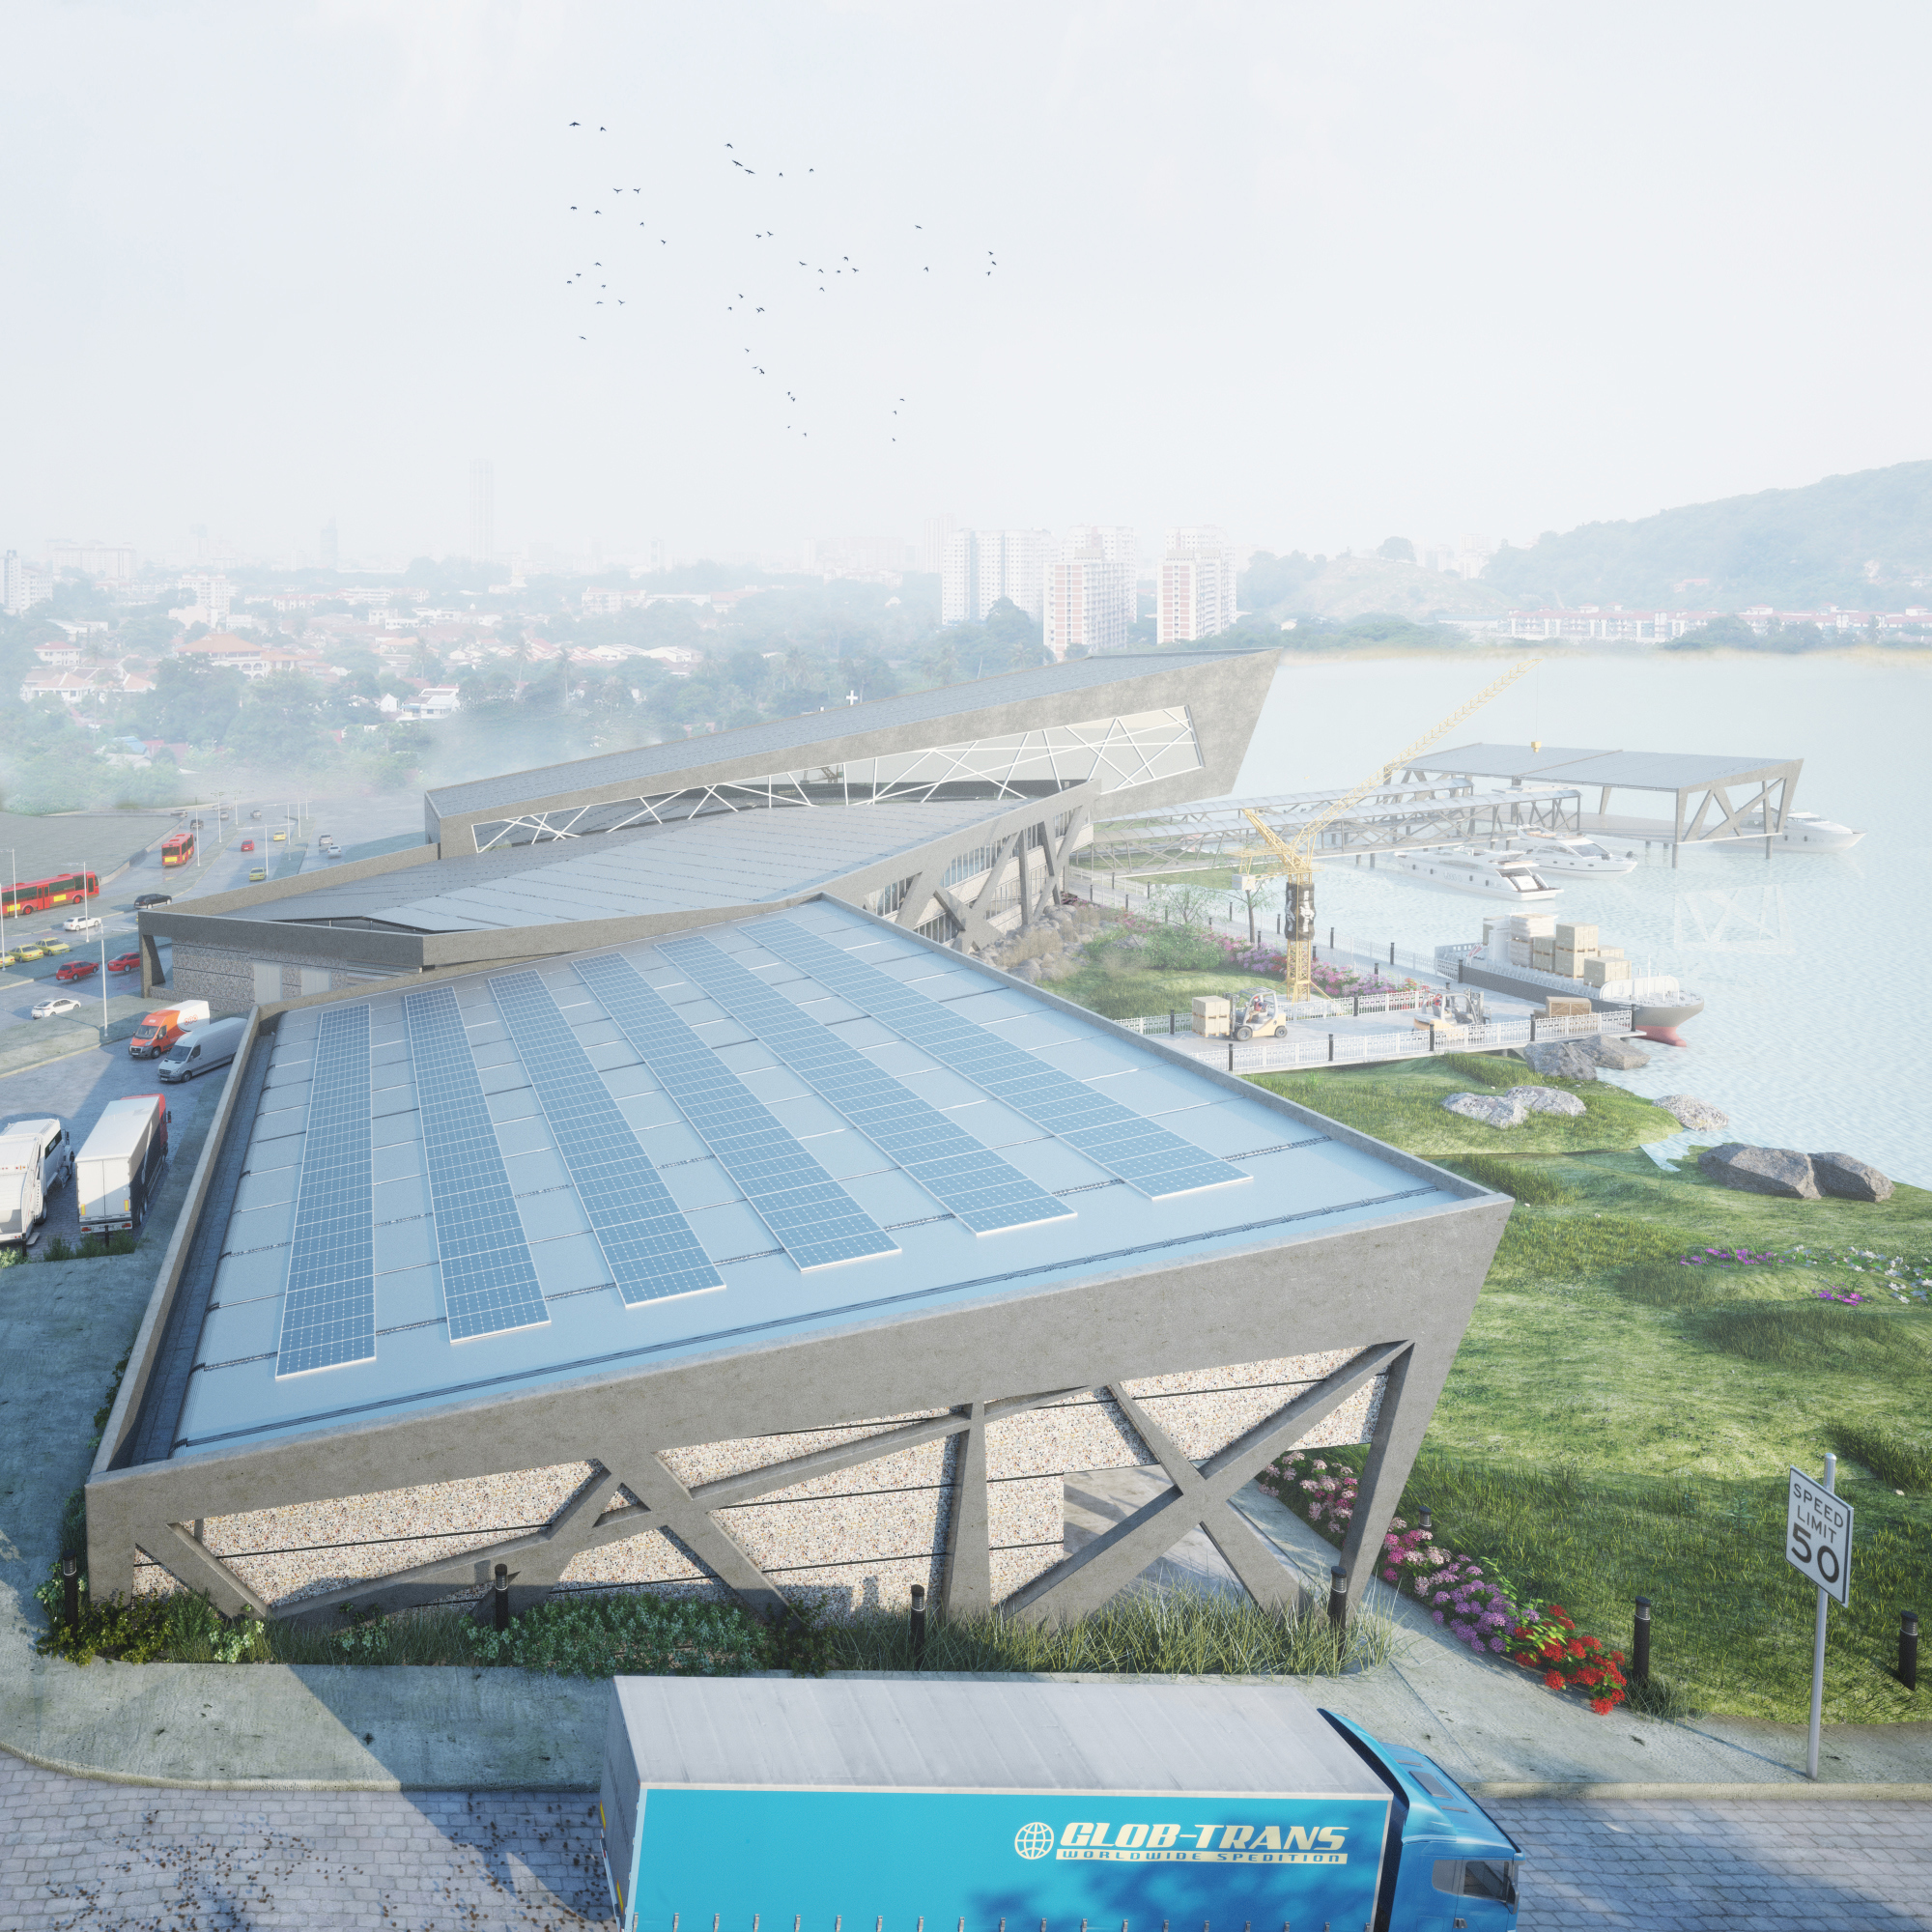 ijede-ferry-terminal-by-okolie-uchechukwu-09-cleec-design